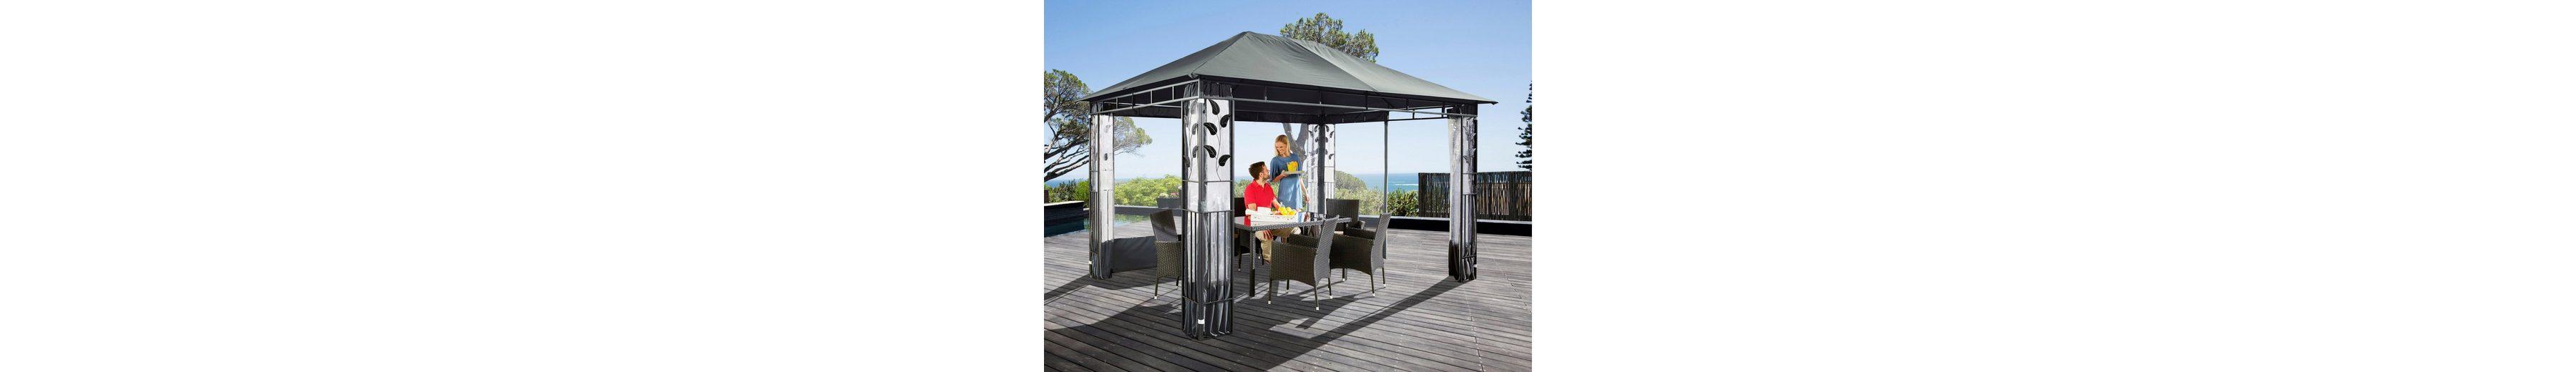 Ersatzdach für Pavillon »Blätter« (3 x 4 m)